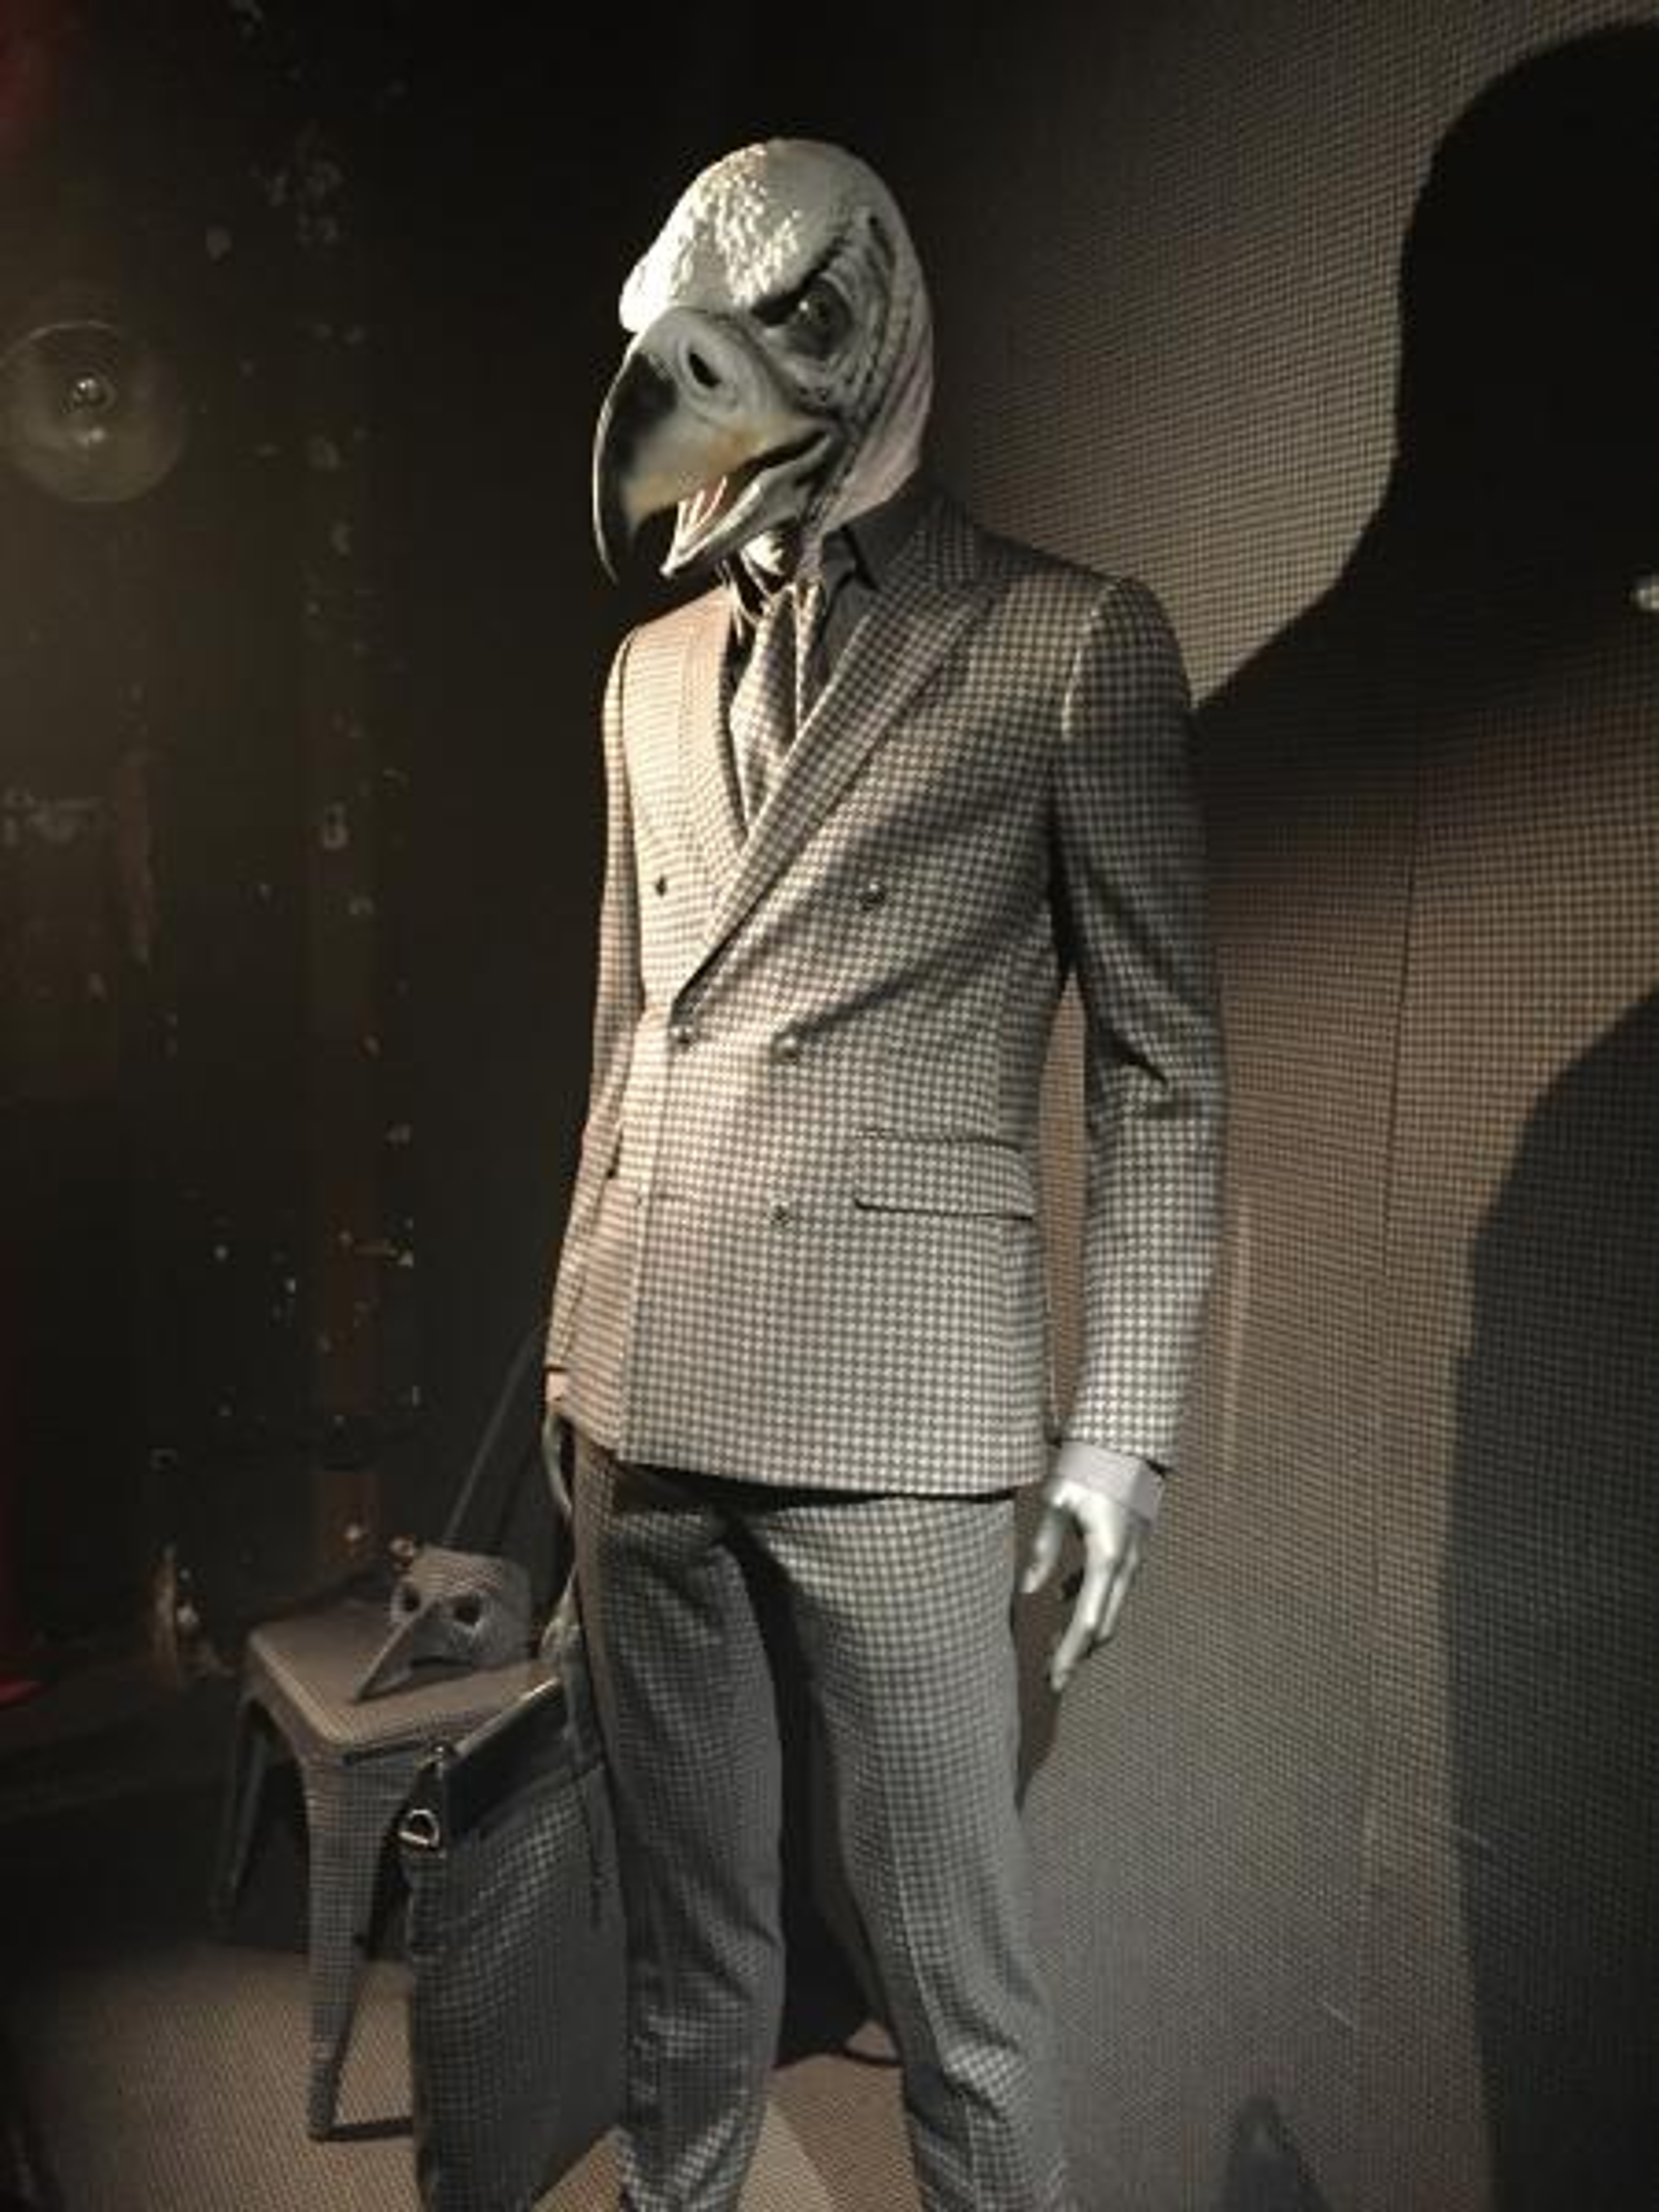 A mannequin in an animal mask wears designer John Varvatos' Men's Fall/Winter 2016 fashion.